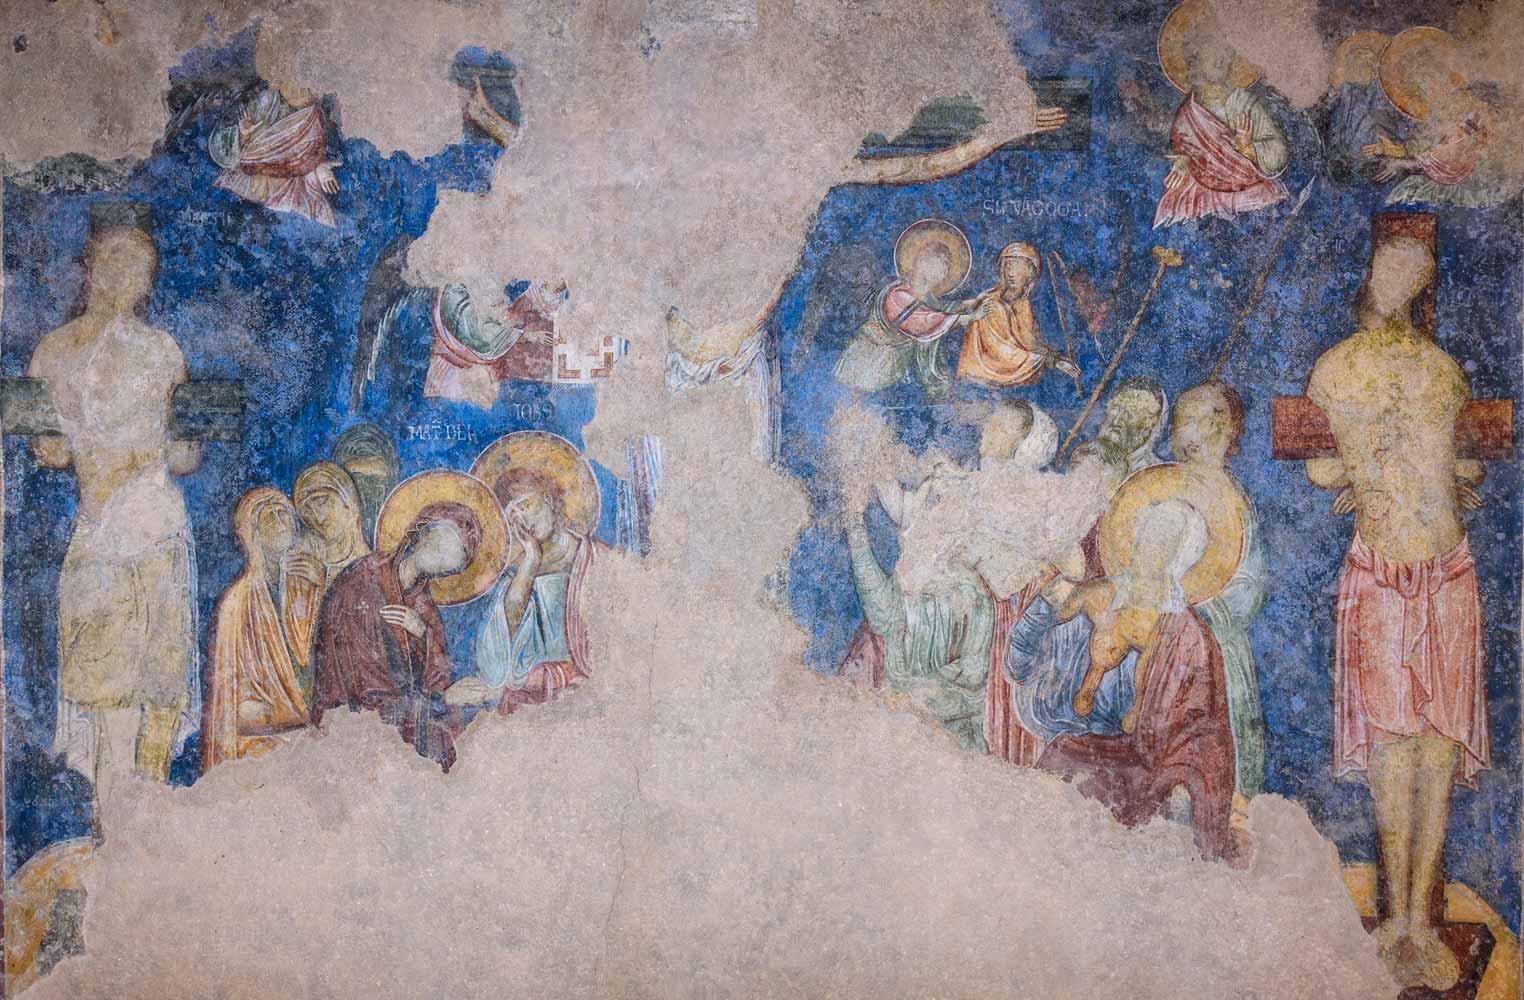 monastere-abu-gosh-crucifixion